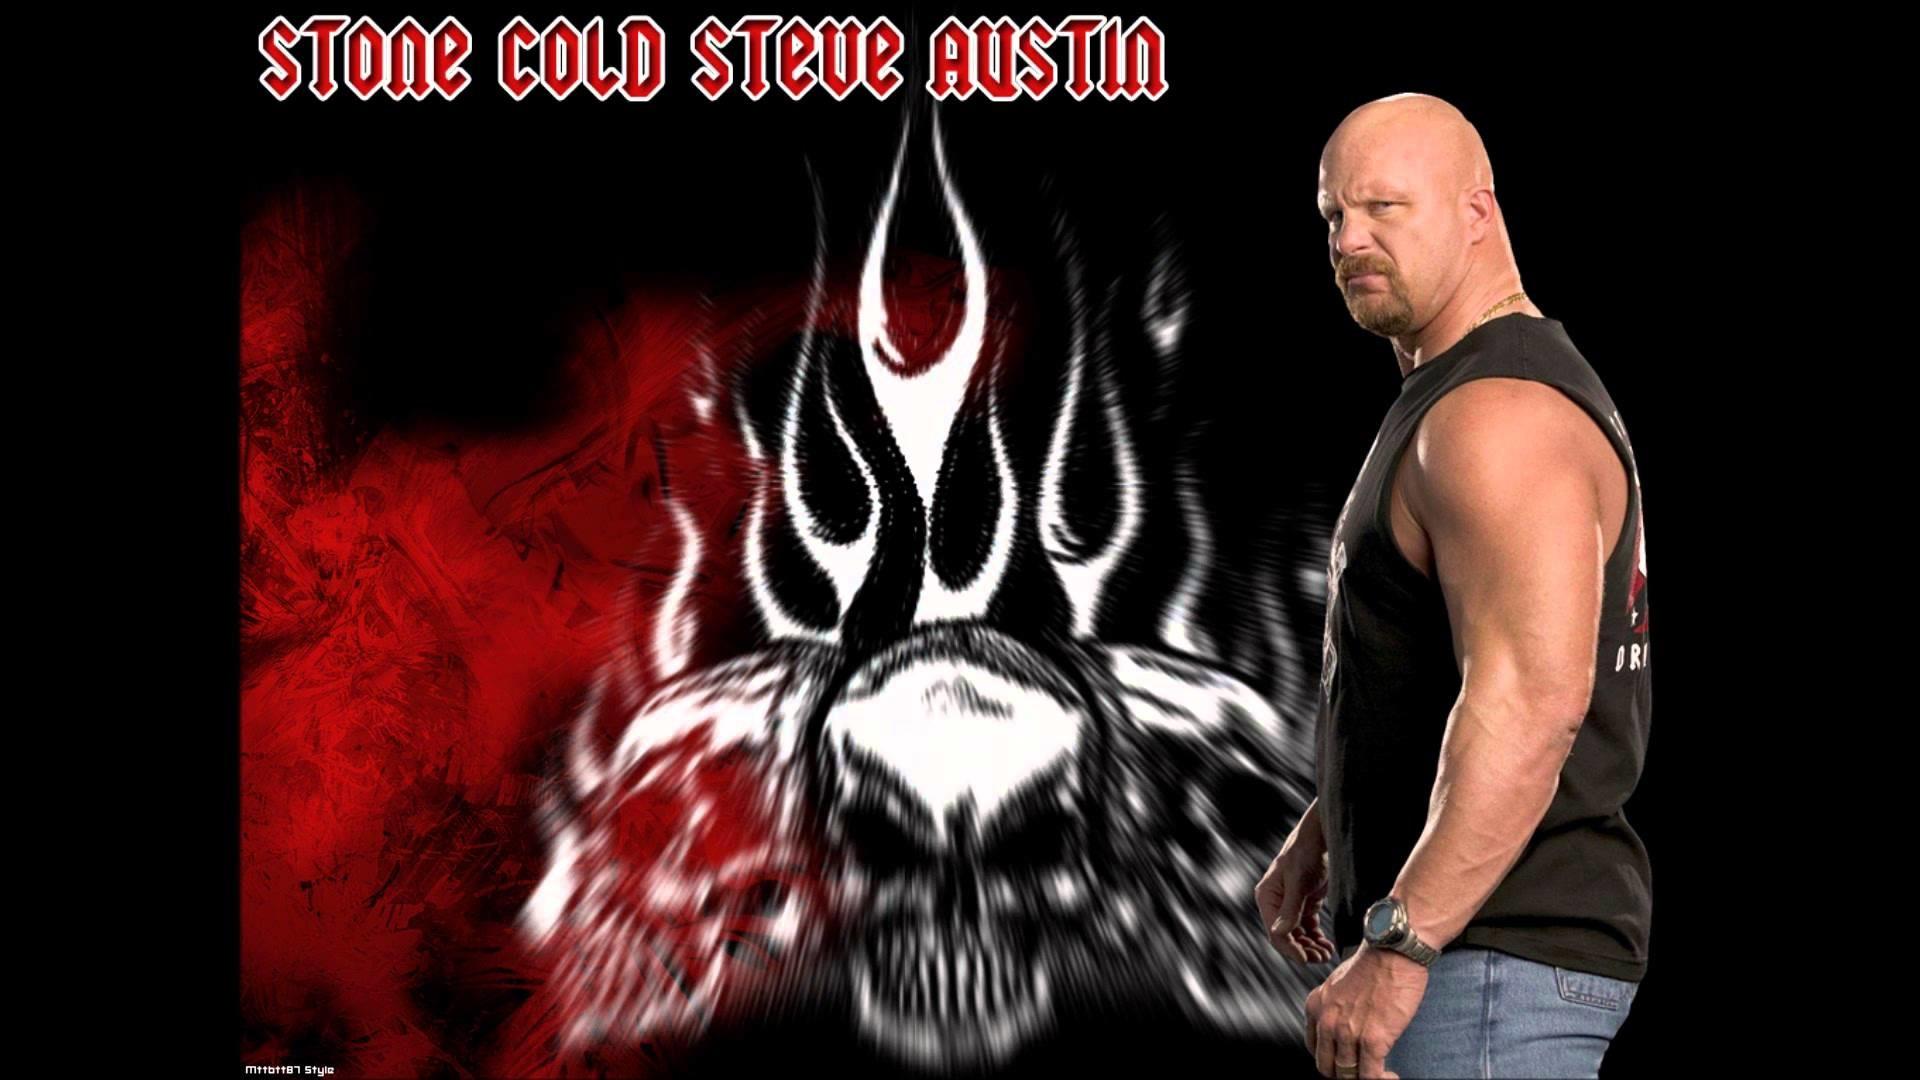 Stone Cold Steve Austin Wallpaper 80 Images